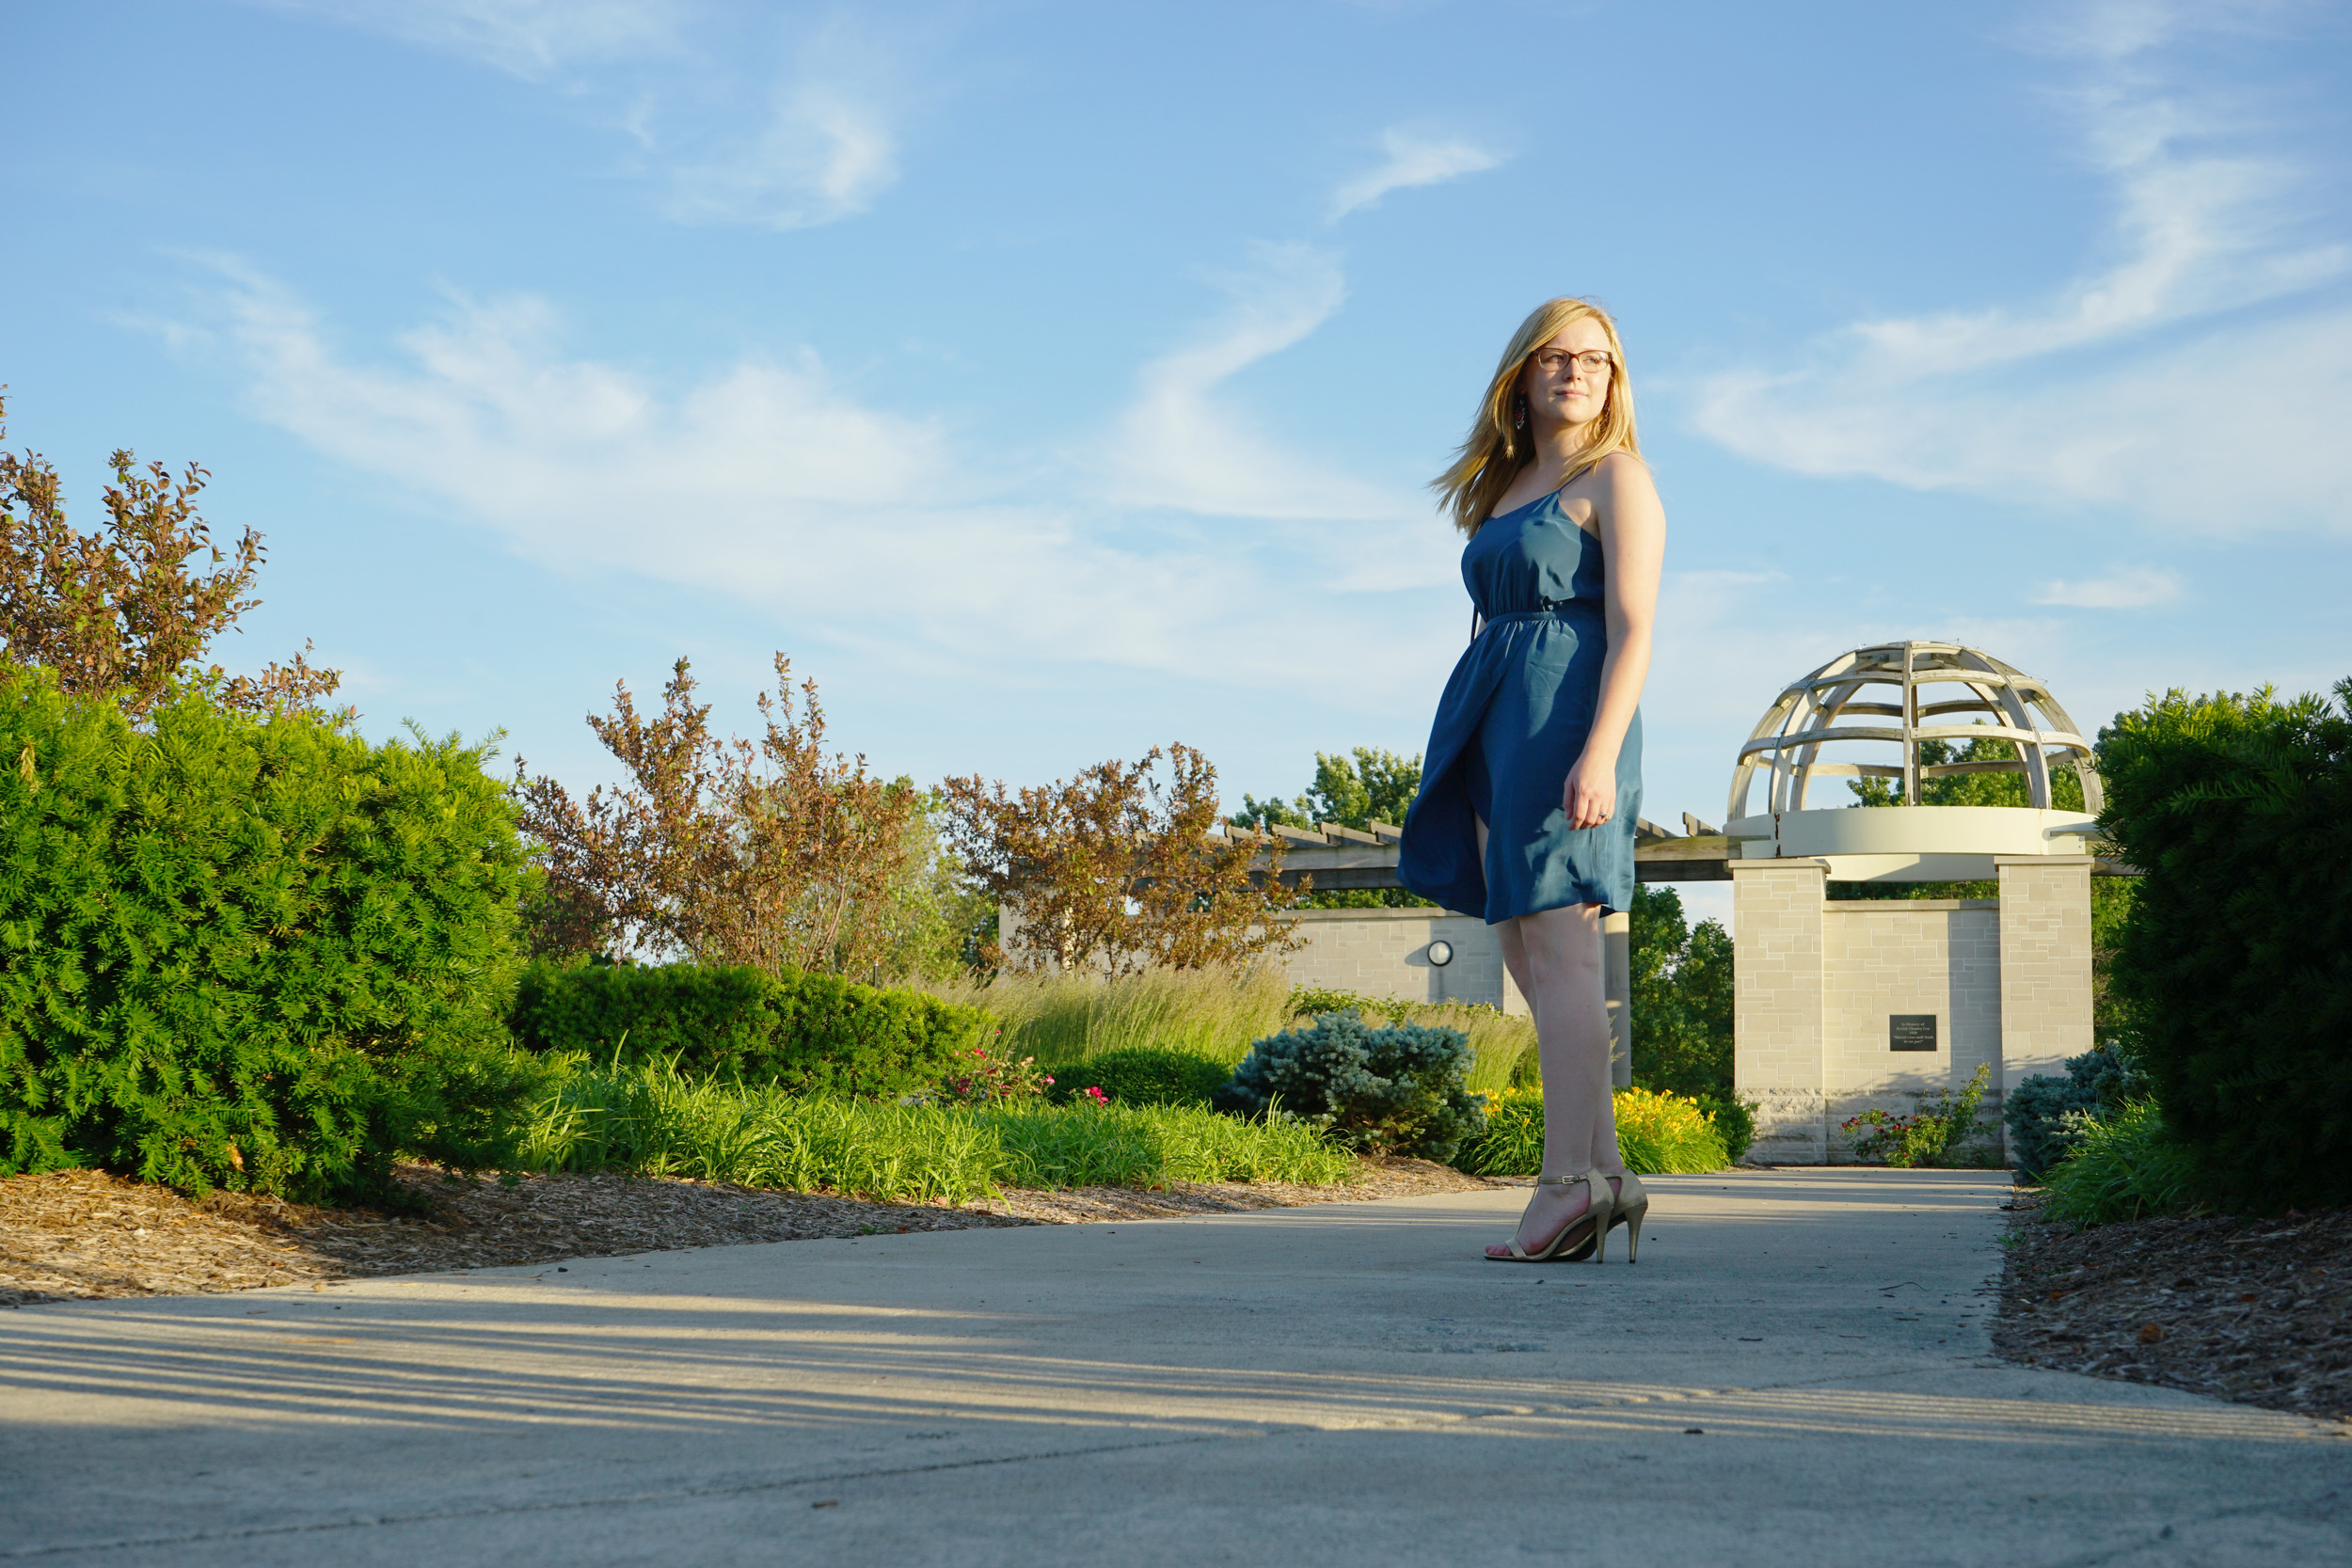 Maggie a la Mode - Teal madewell dress 1.JPG